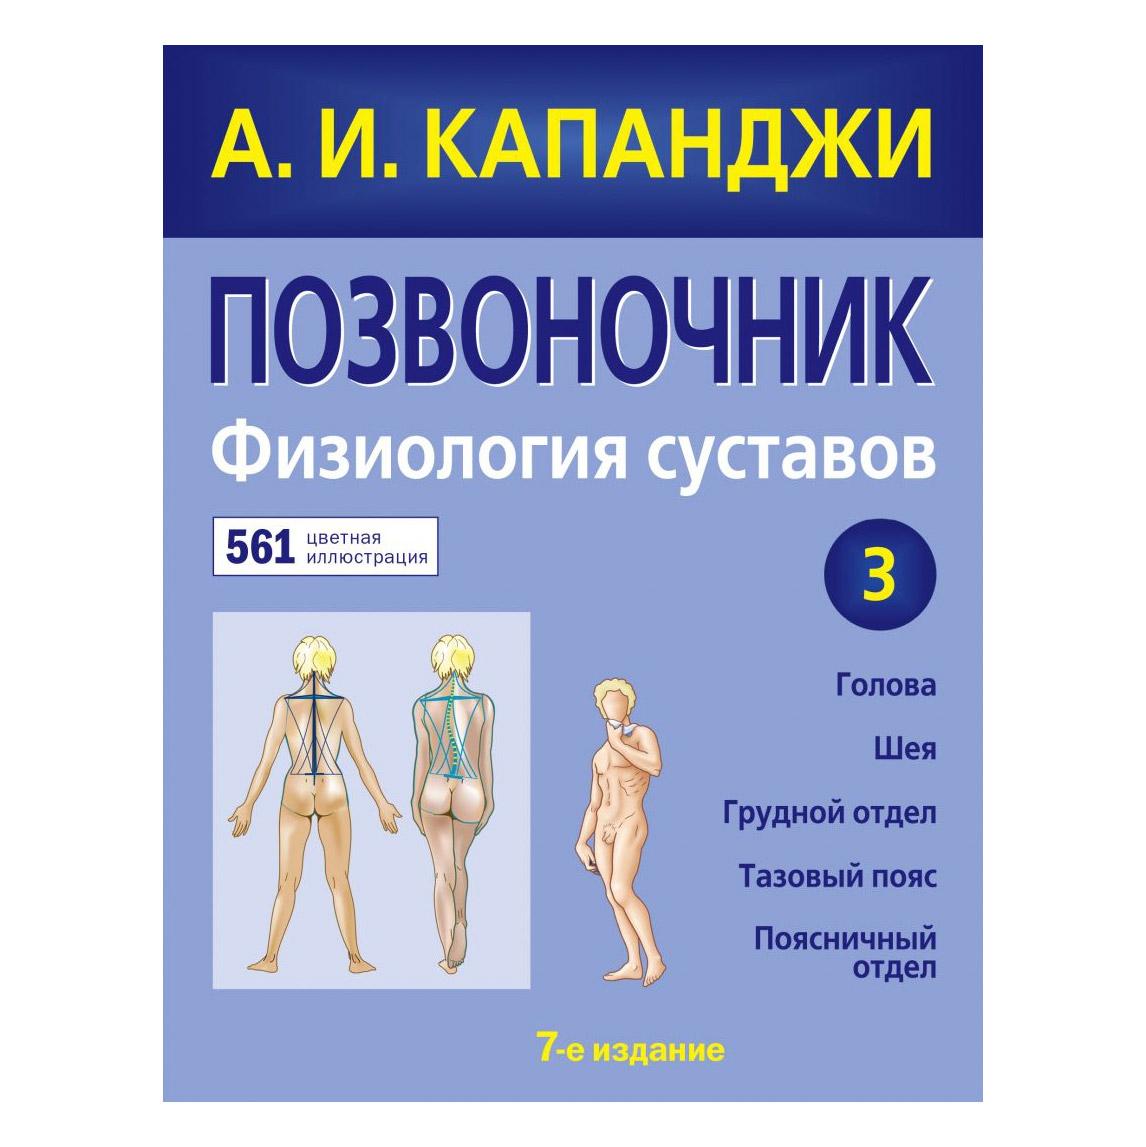 Книга Эксмо Позвоночник: Физиология суставов